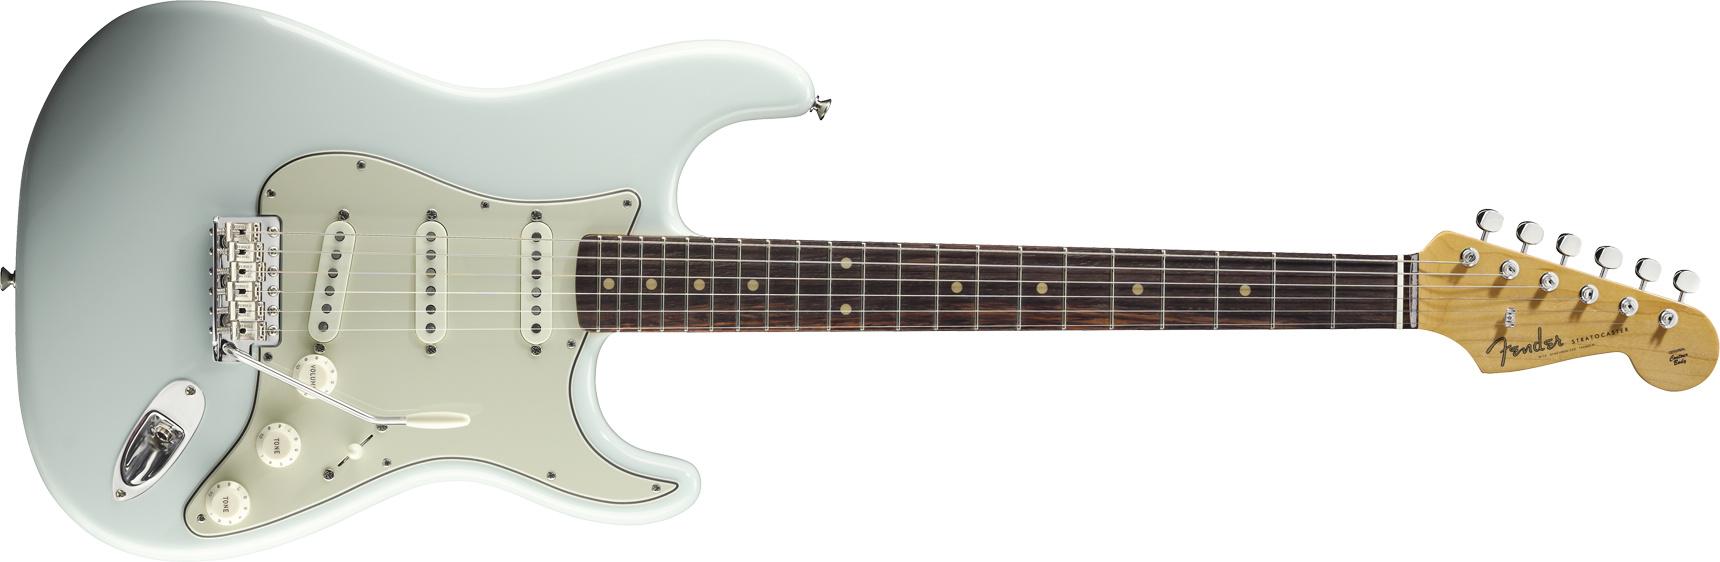 fender品牌_电吉他_american